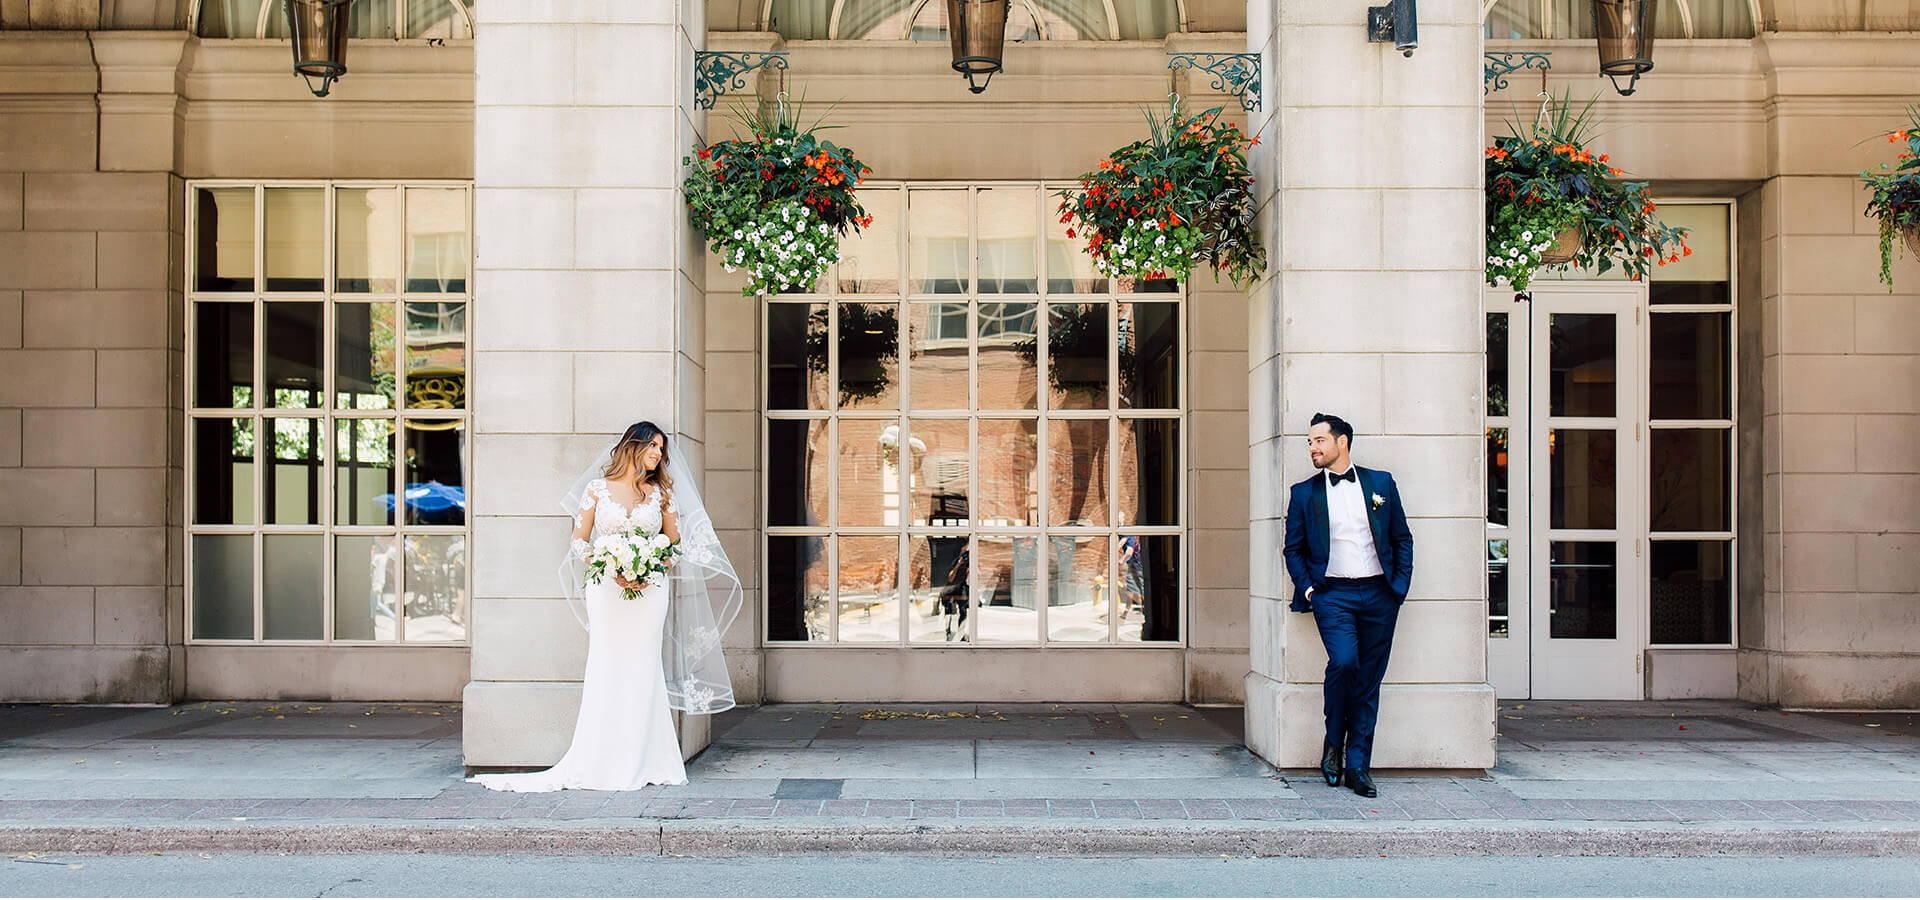 Hero image for Jessica and Daniel's Luxe Garden Wedding at York Mills Gallery